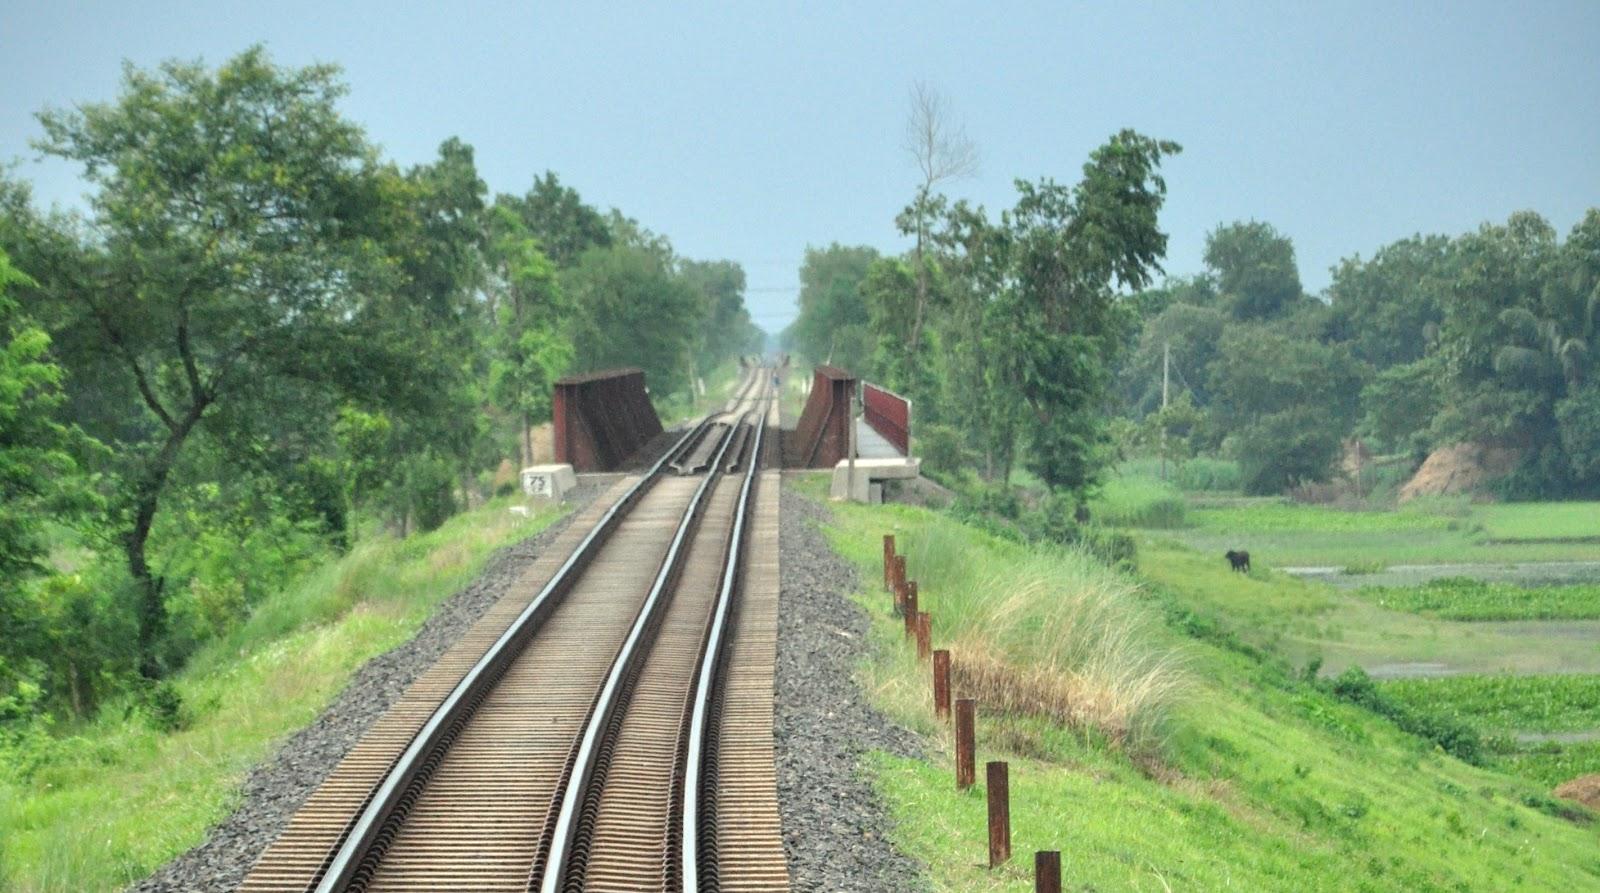 Storage: BEAUTIFUL BANGLADESH: moner-janalay-rouddur.blogspot.com/2012/06/beautiful-bangladesh-1.html